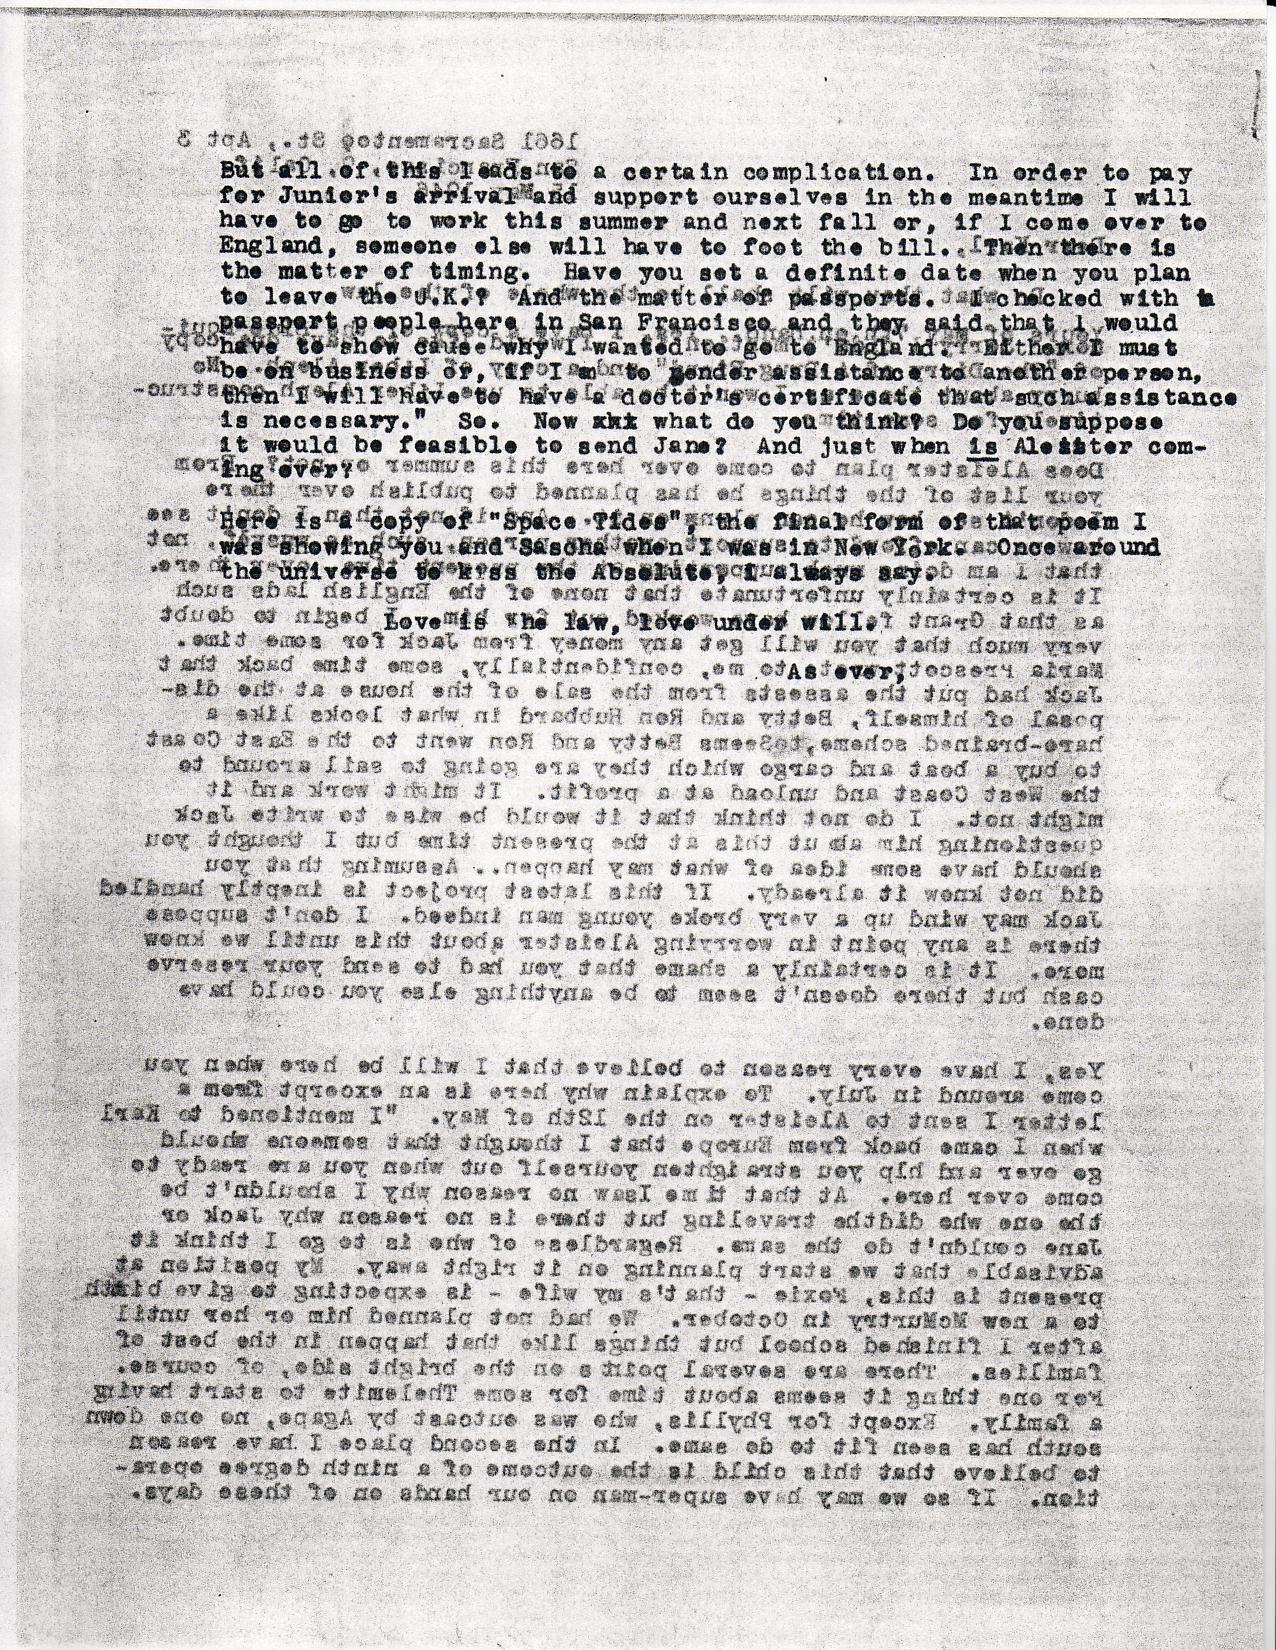 grady mcmurtry to karl germer the grady mcmurtry project 05 15 1946 grady mcmurtry to karl germer pg 2